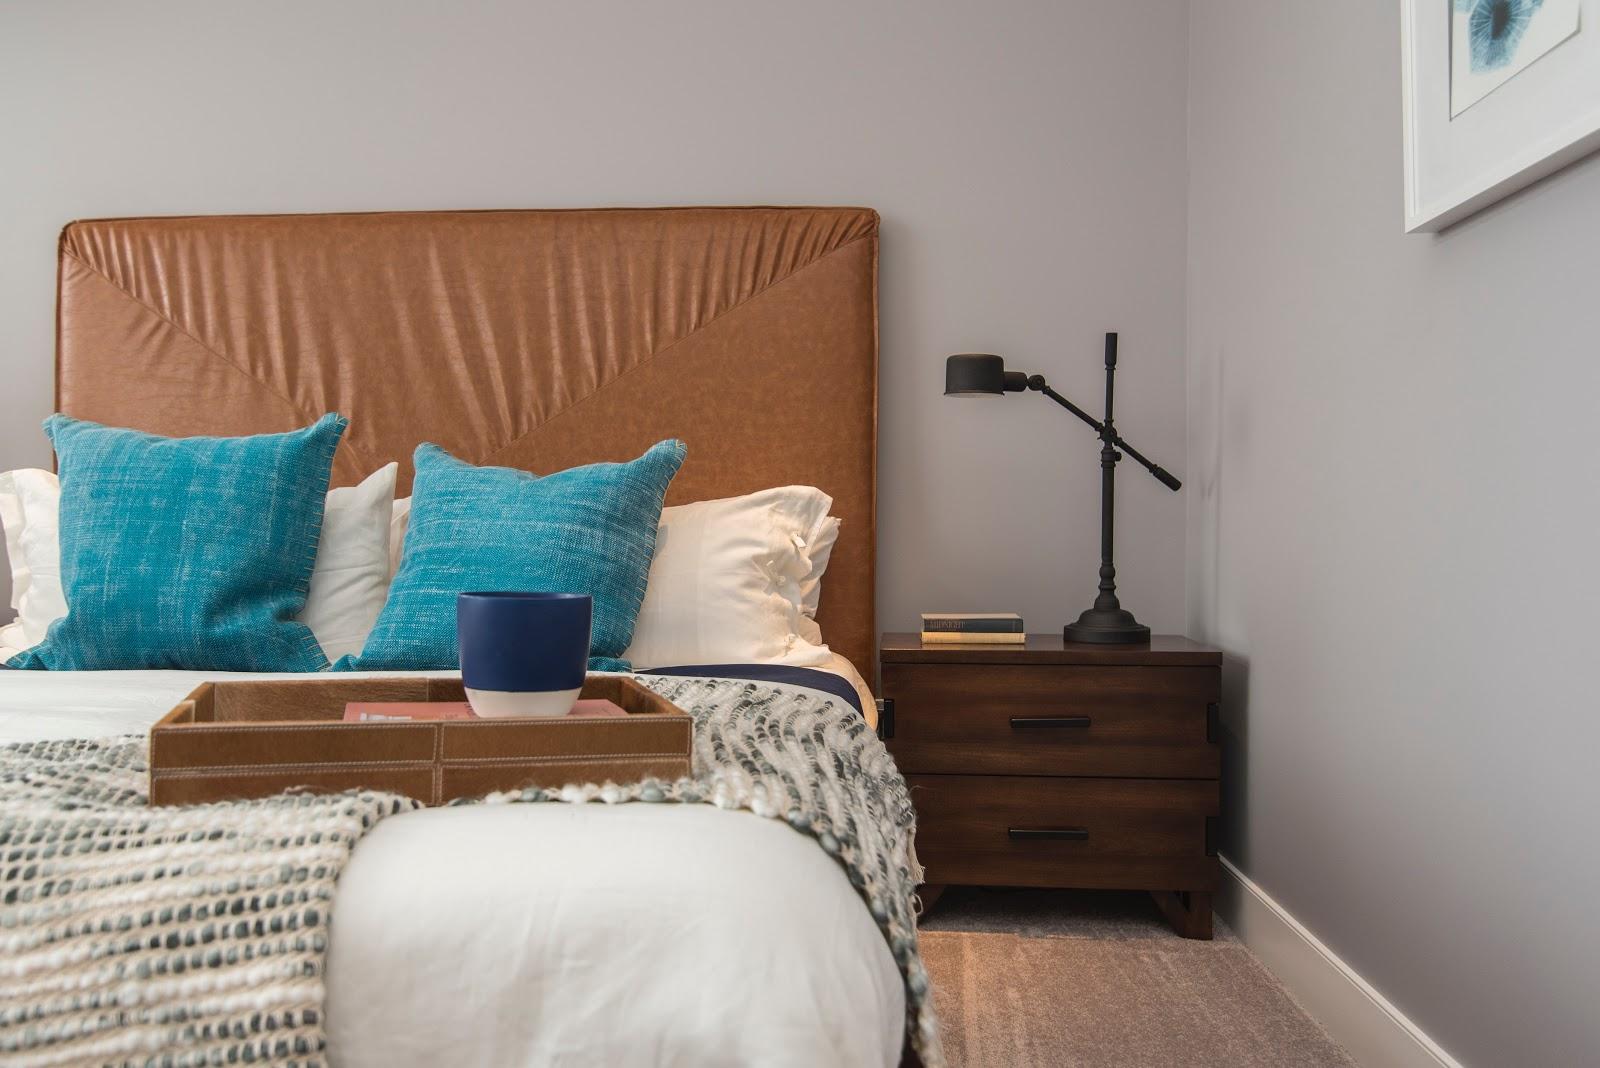 5 Most Effective Sleep Hygiene Tips